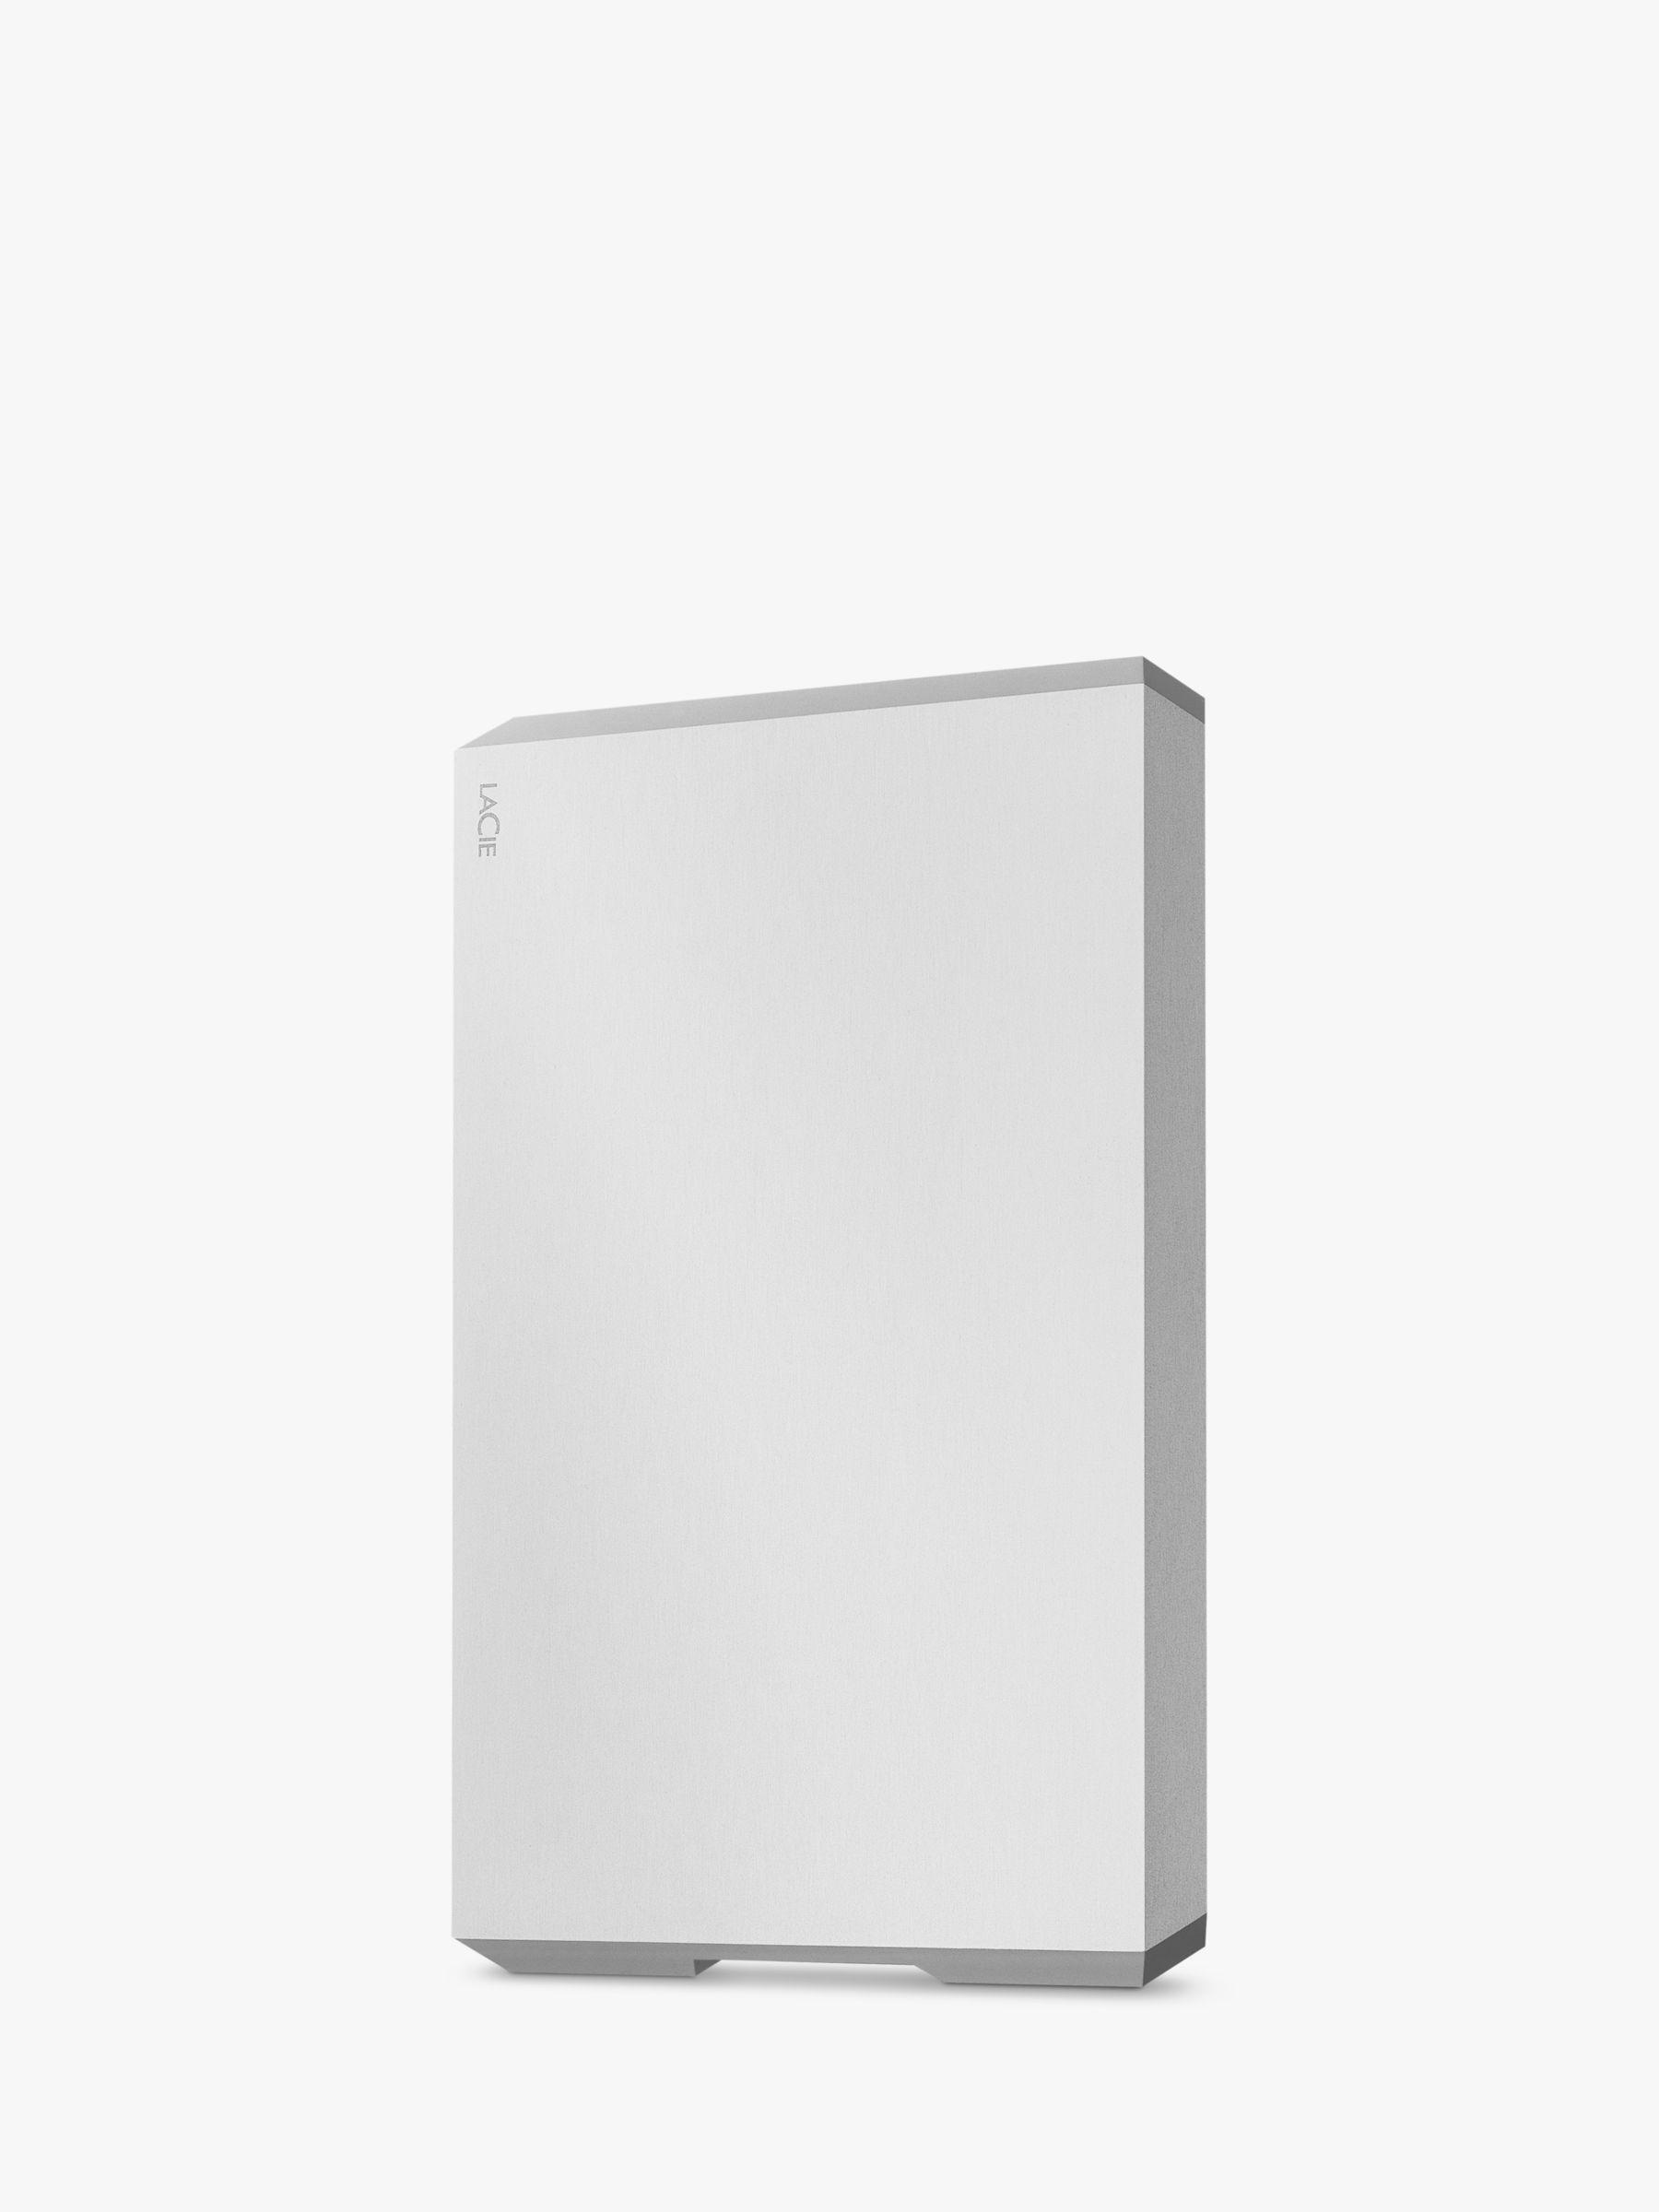 Lacie LaCie STHG2000400 External Hard Disk Drive, 2TB, USB Type-C, Silver